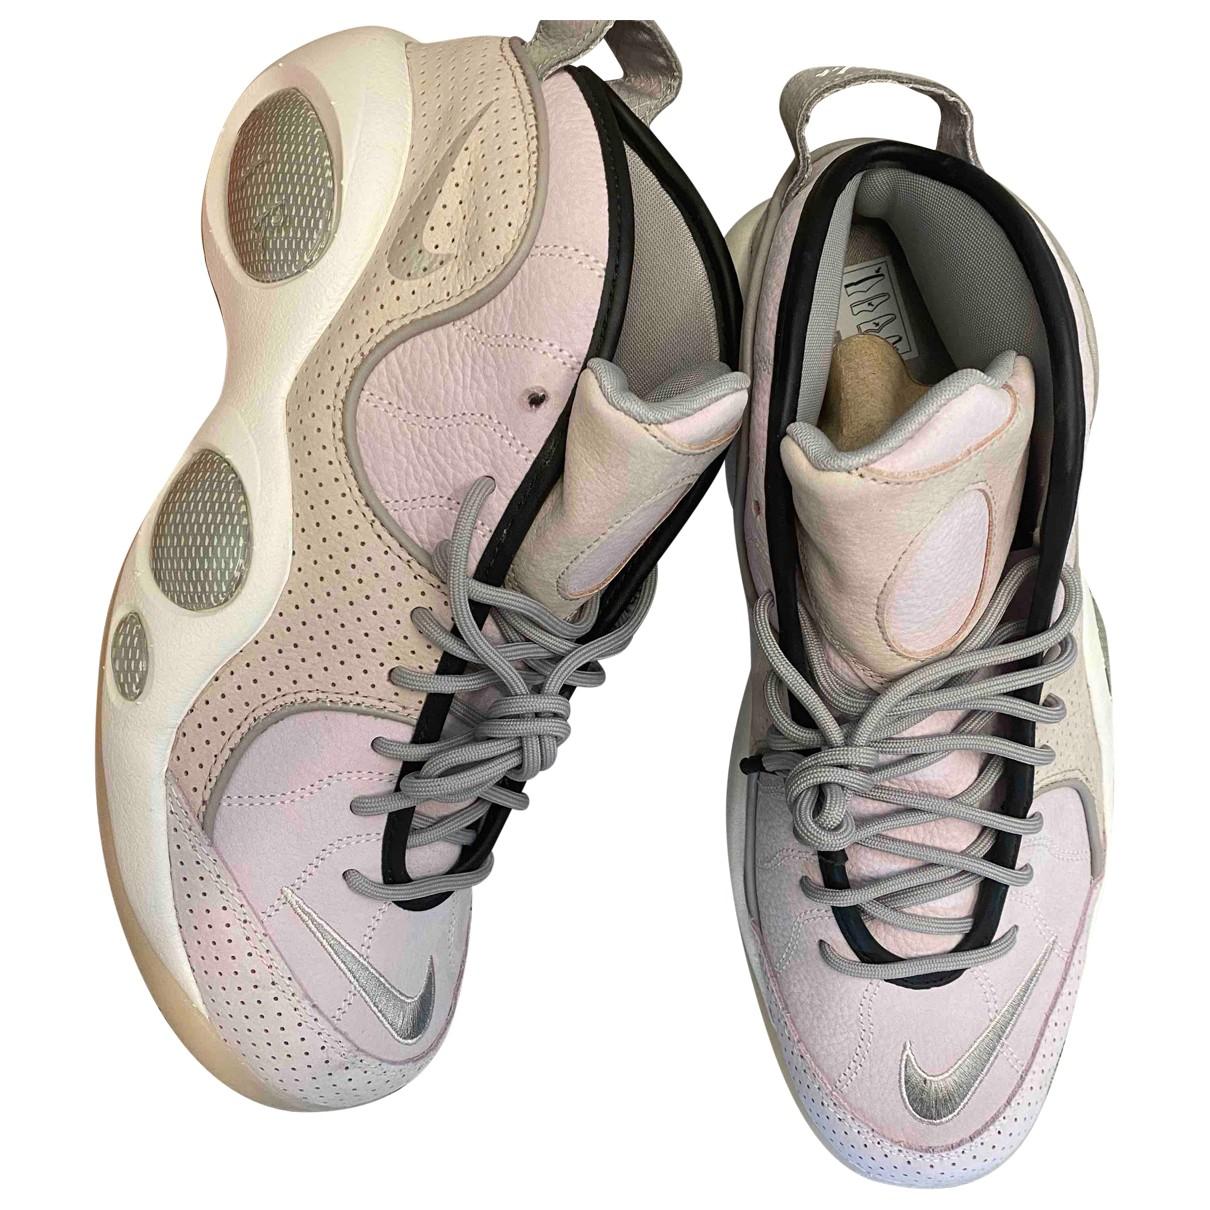 Nike - Baskets Zoom pour homme en cuir - rose